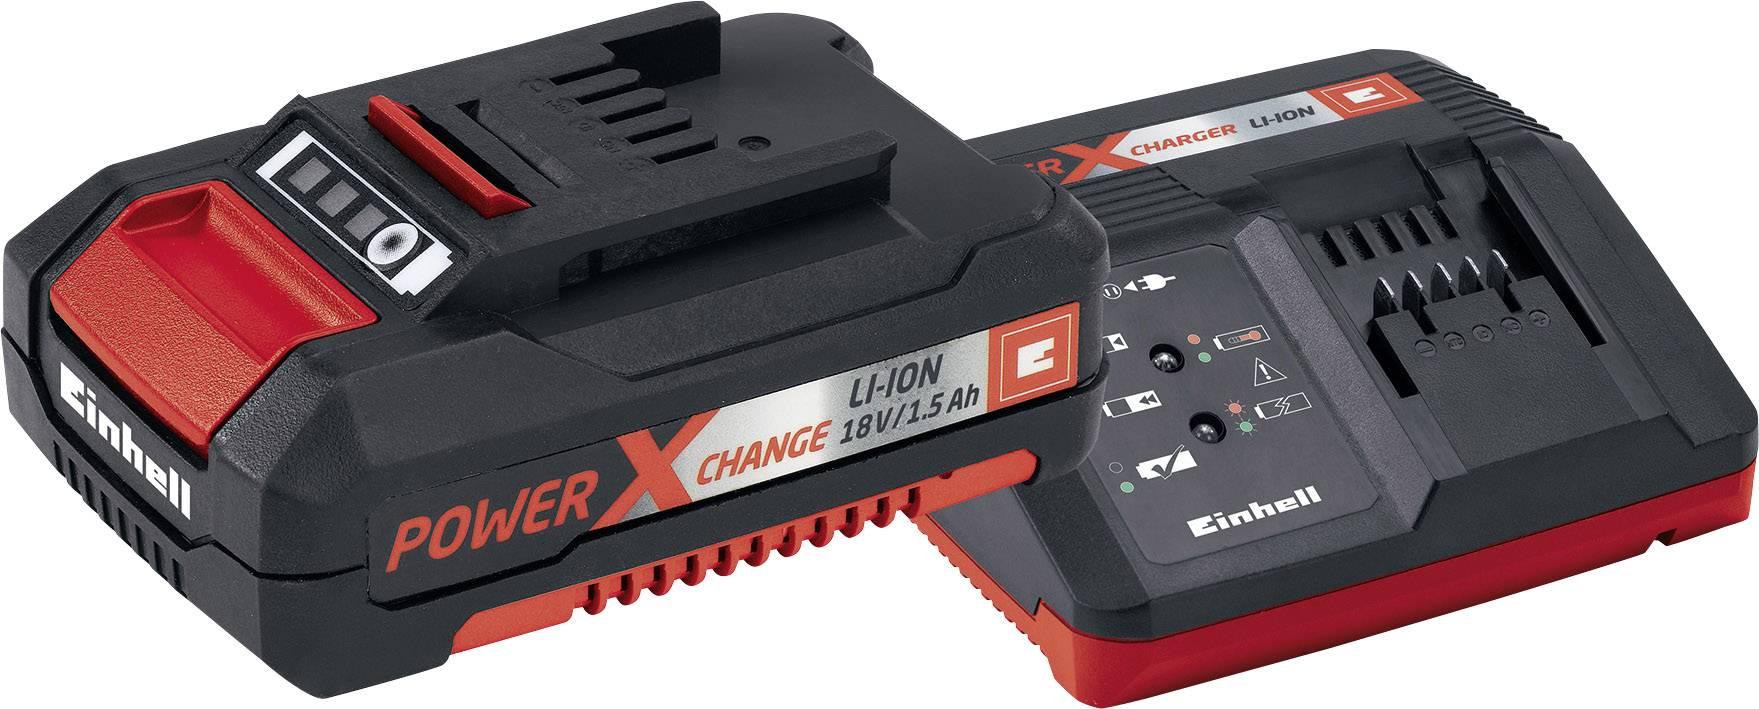 Sada nabíječky Einhell Power X Change + Li-Ion akupack 18 V/1,5 Ah, 4512021